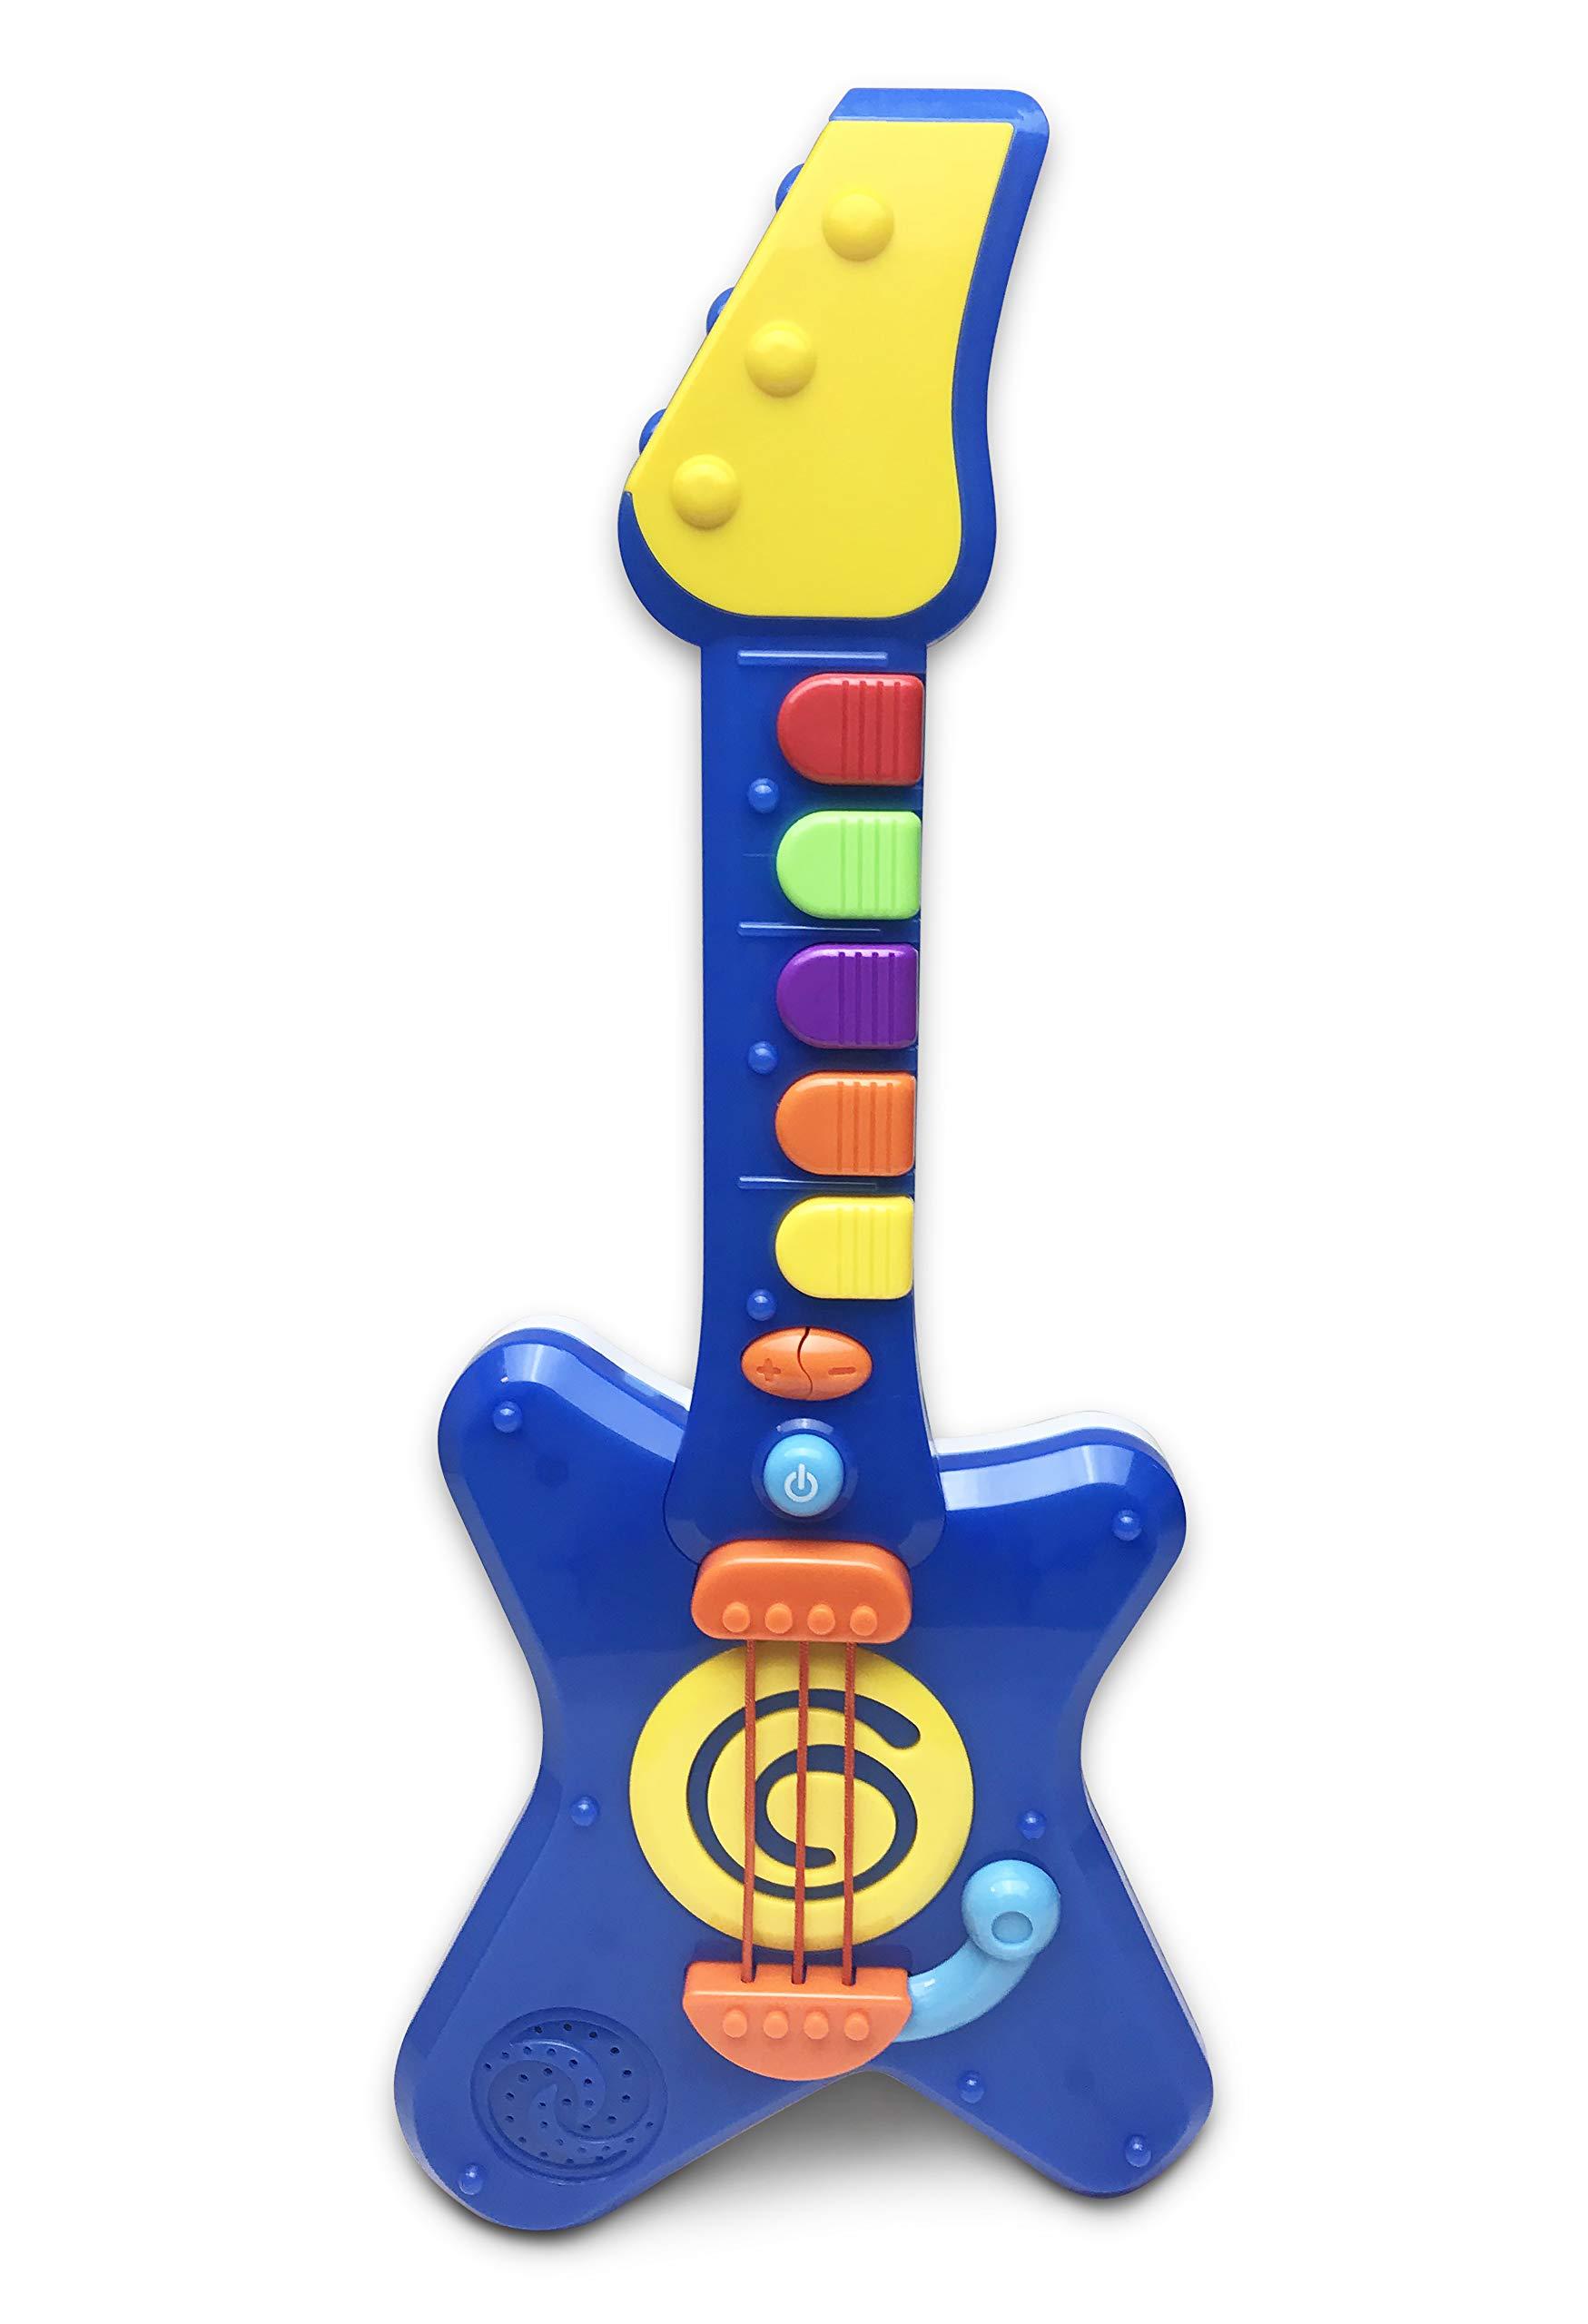 Hunson Jump'n Jive Pre-School Rock'n Roll Light and Sound Guitar Play Set by Hunson